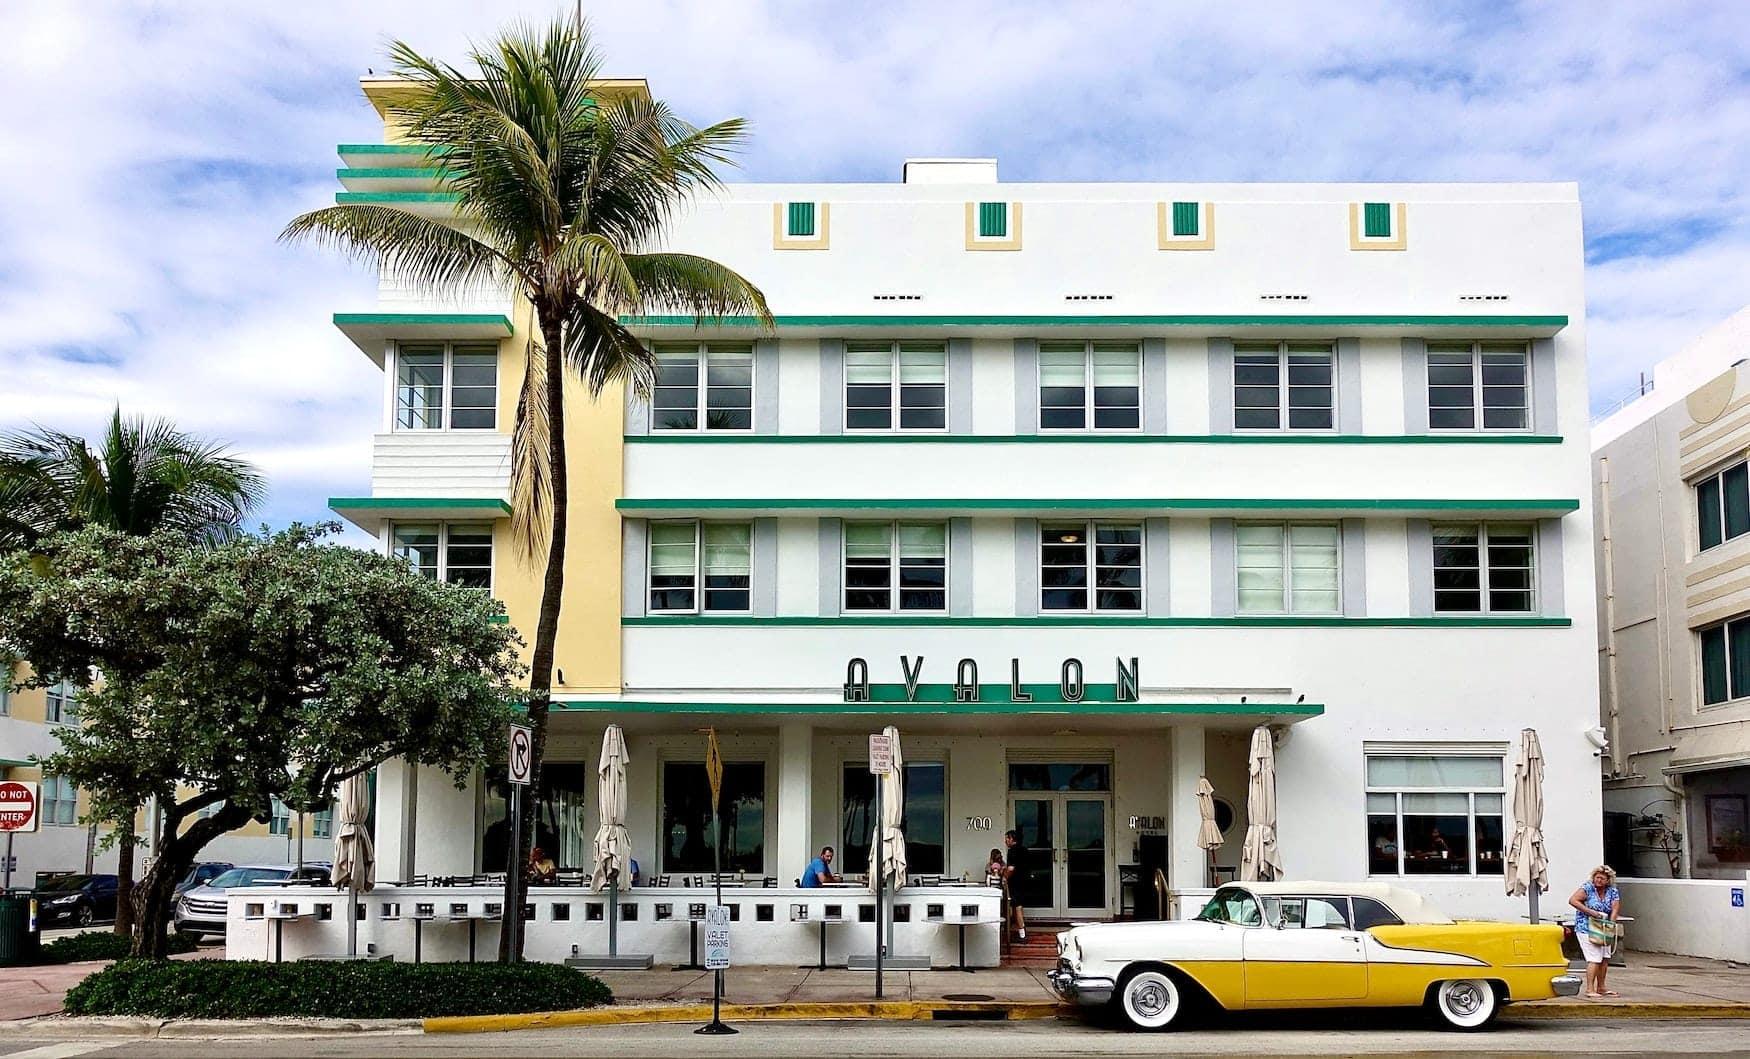 Hoteleingang in Miami, Florida